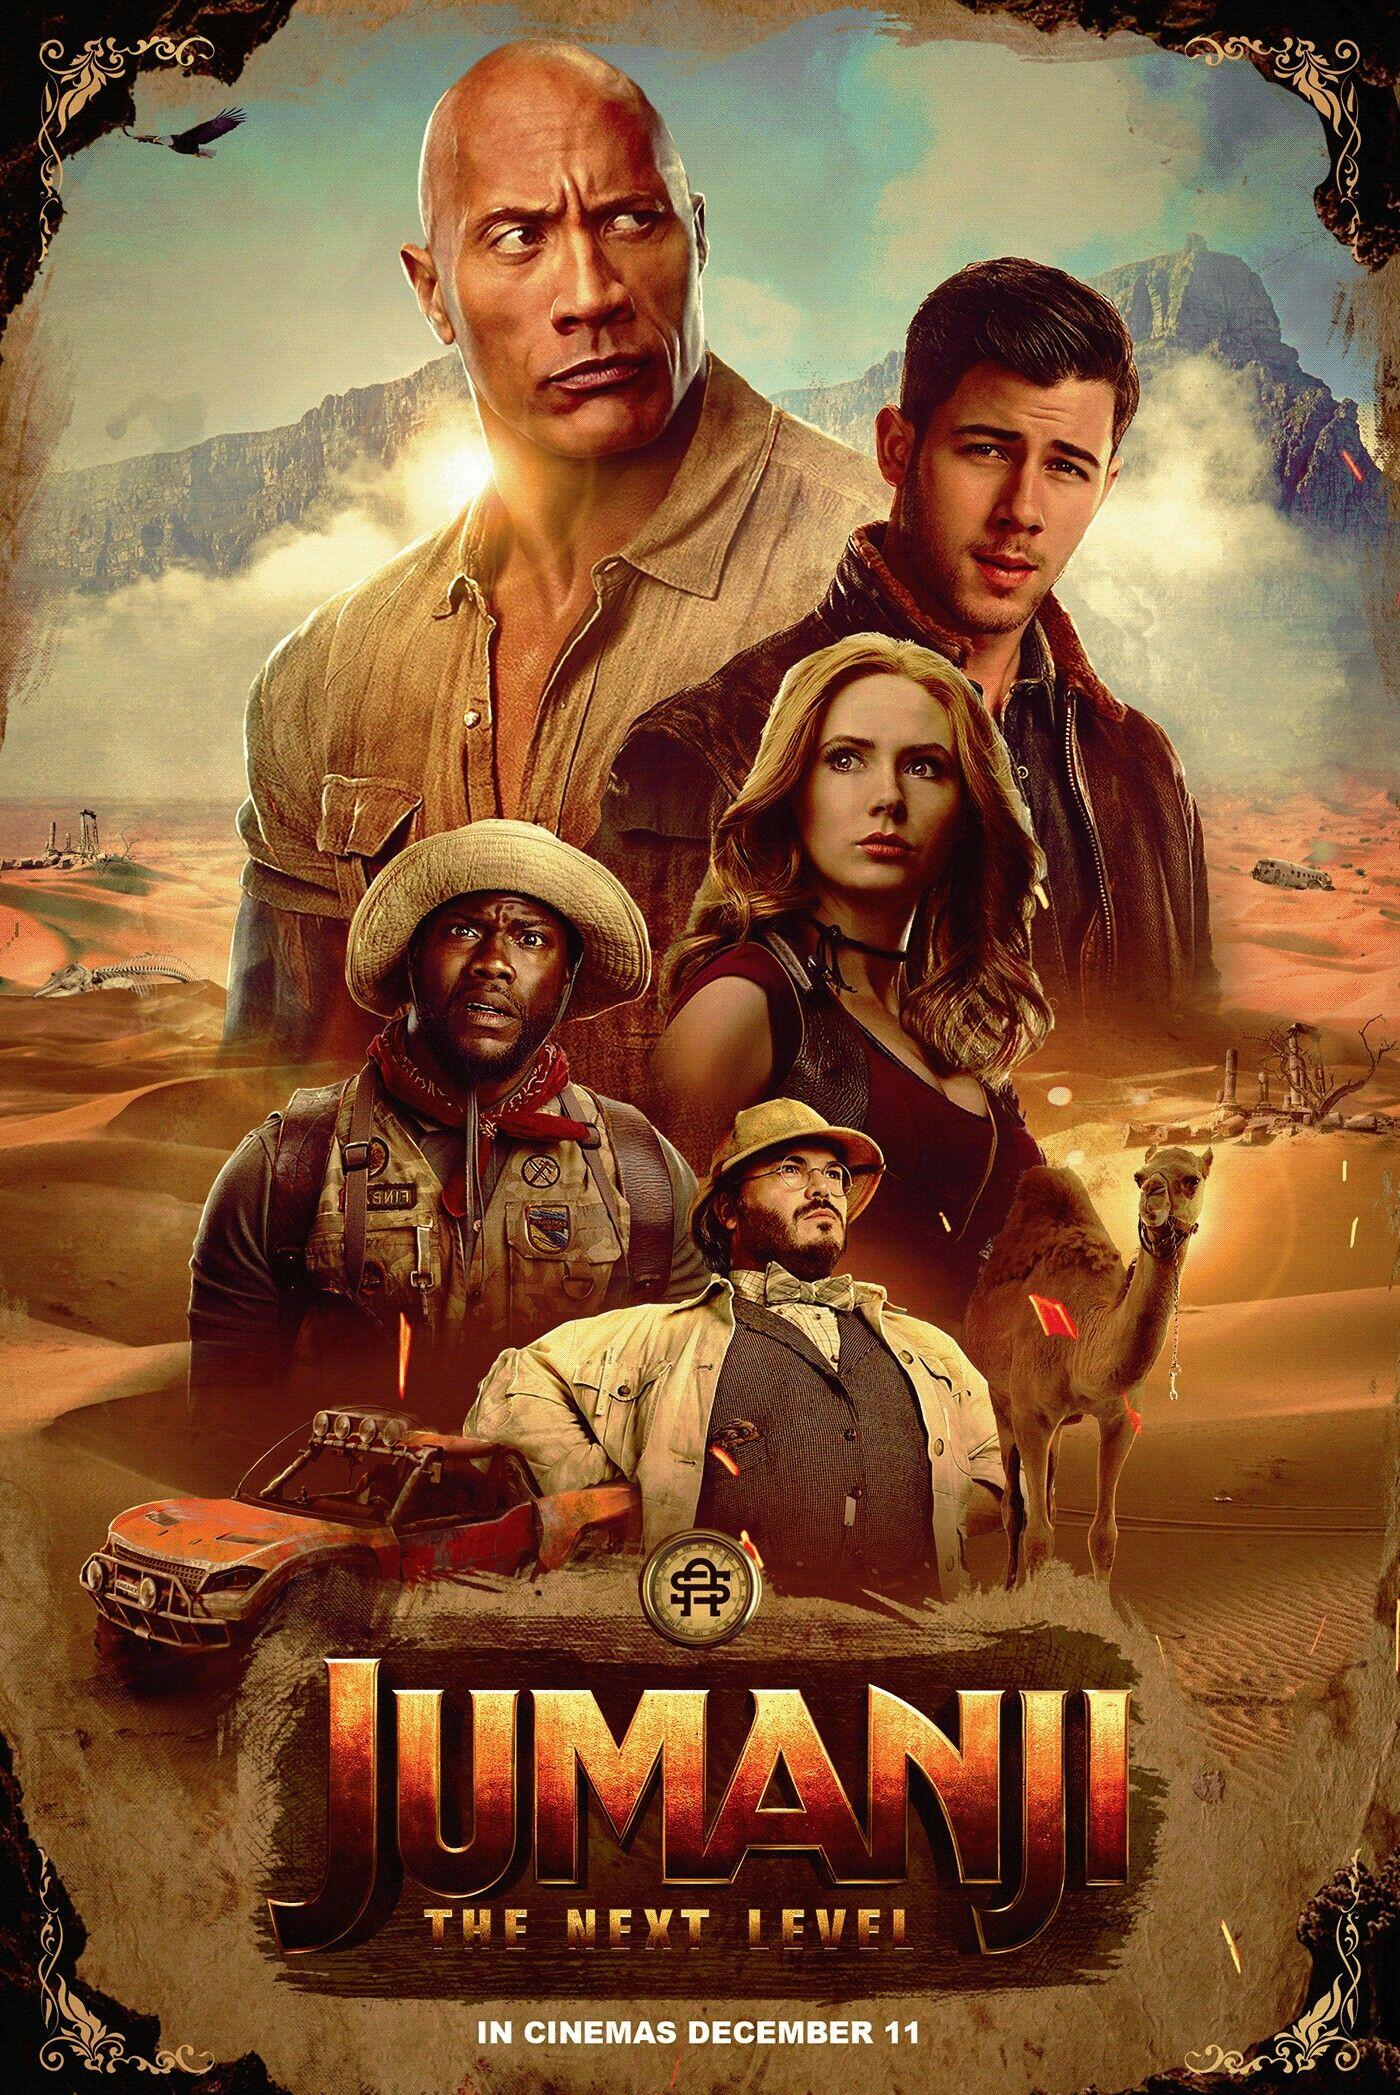 Jumanji The Next Level In 2020 Download Movies Jumanji Movie Adventure Movies